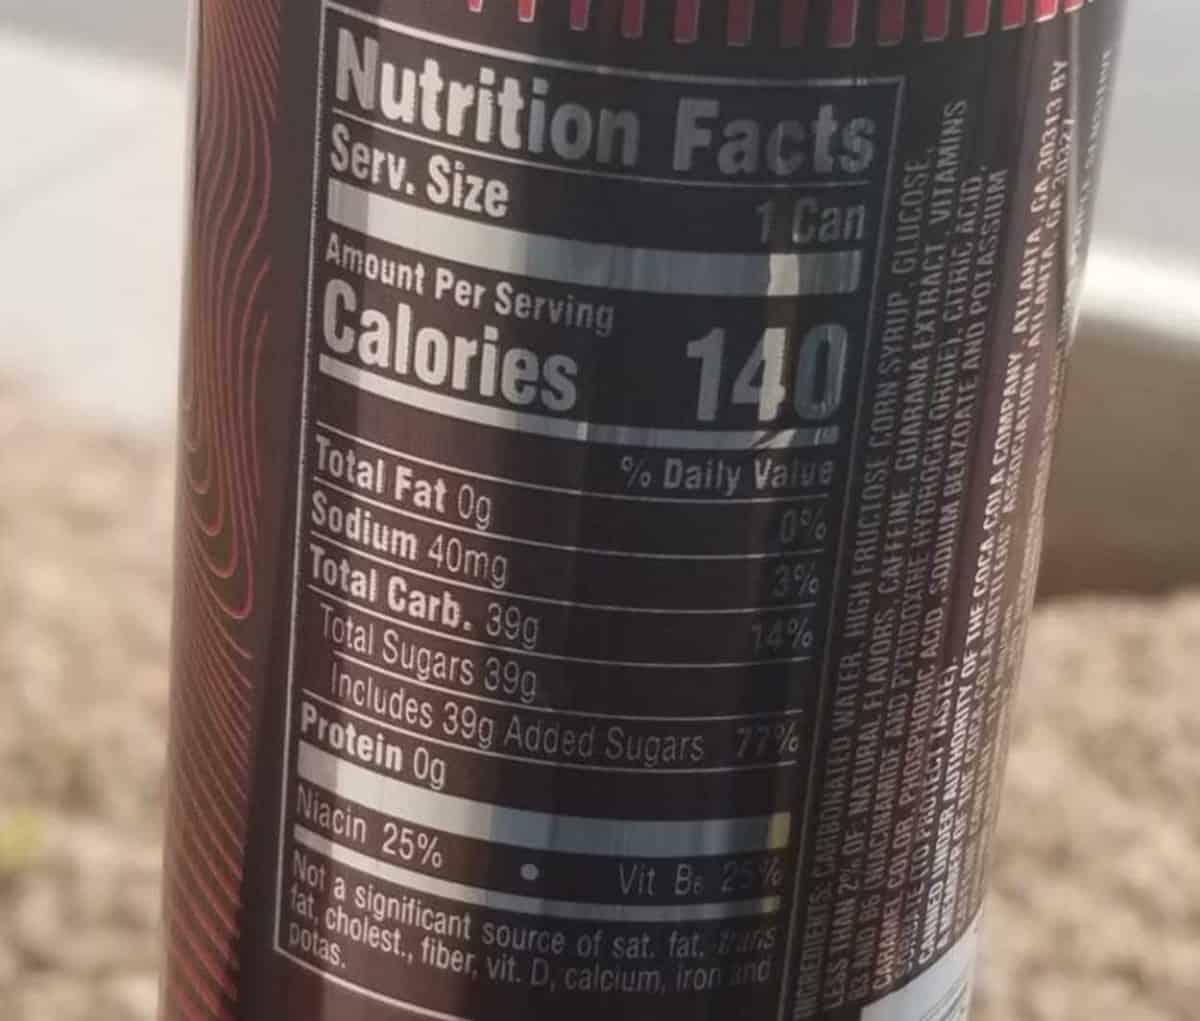 Coca-Cola Energy nutrition facts label